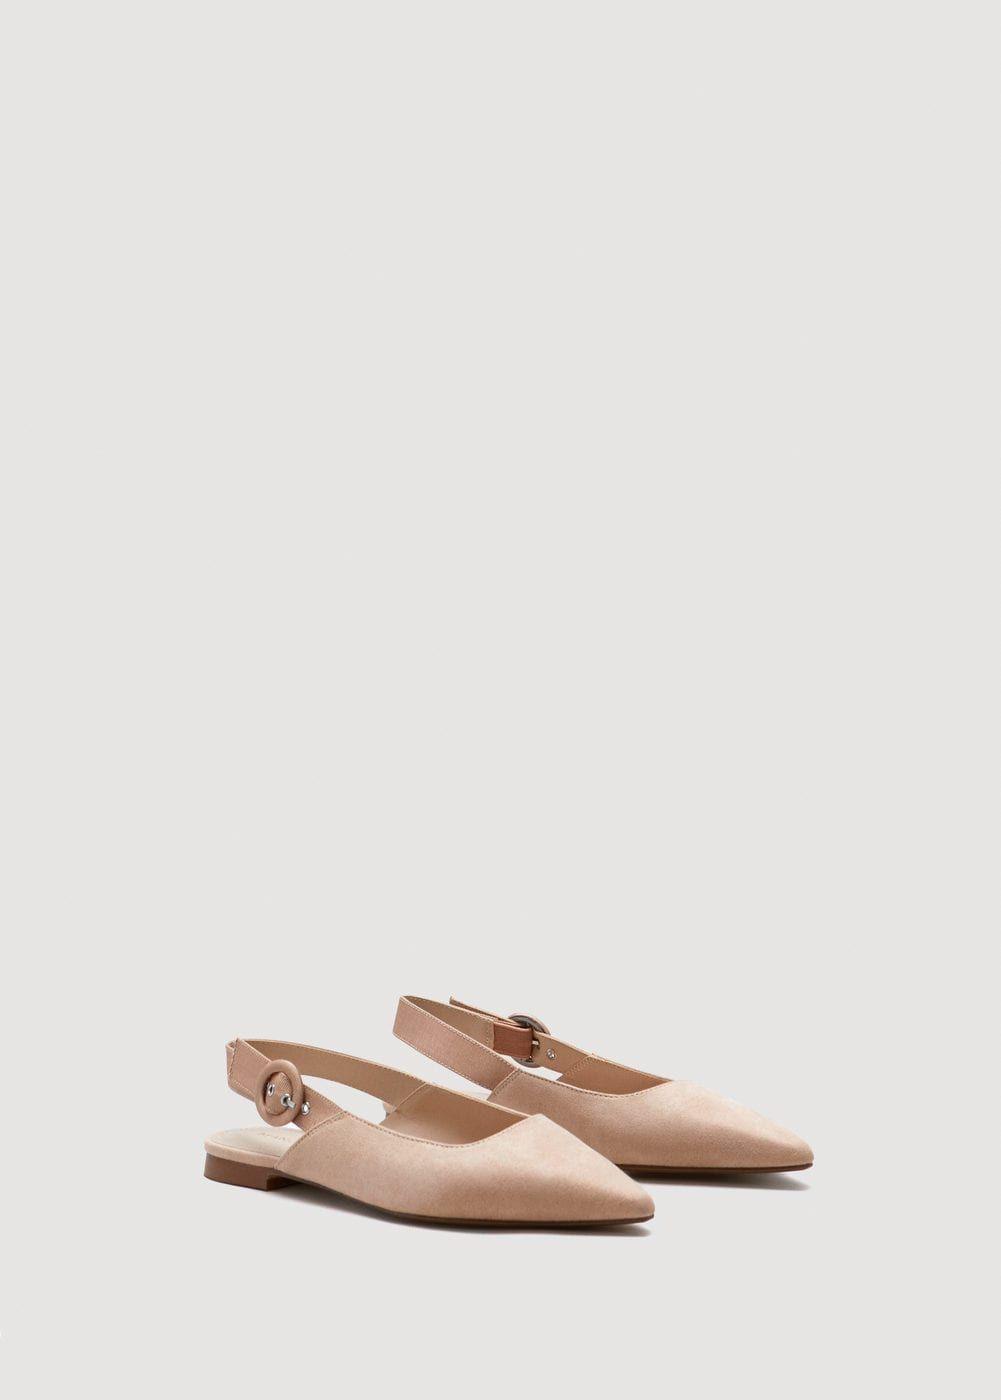 dbe212dd09068 Ankle-cuff slingback shoes - Women   accessorize   Pinterest ...